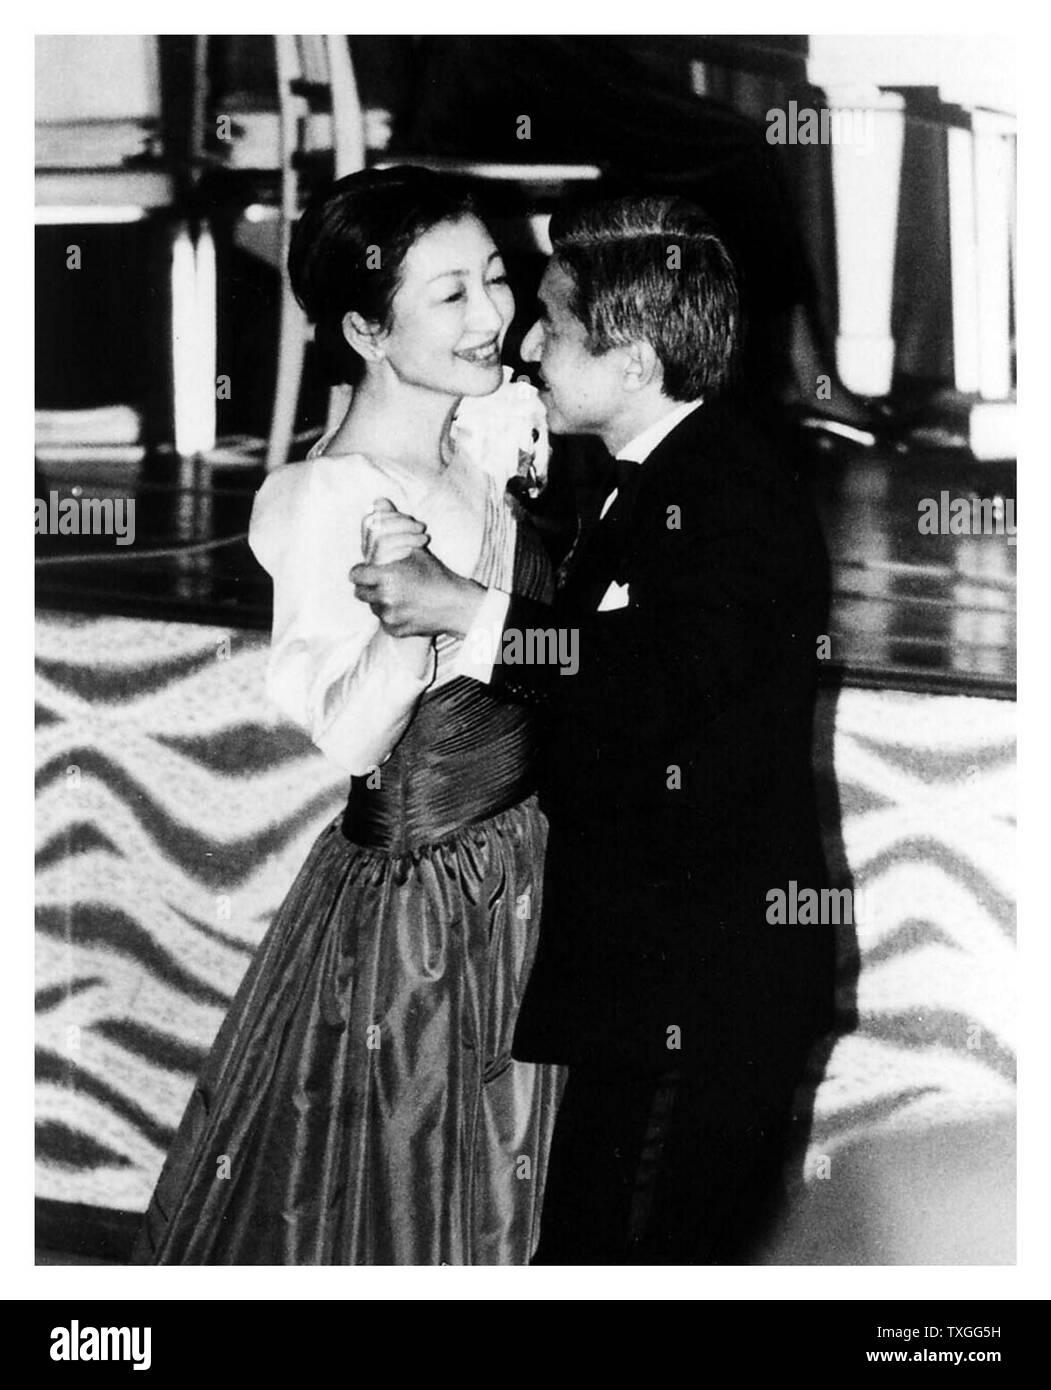 Emperor Akihito and Empress Michiko of Japan 1989 - Stock Image